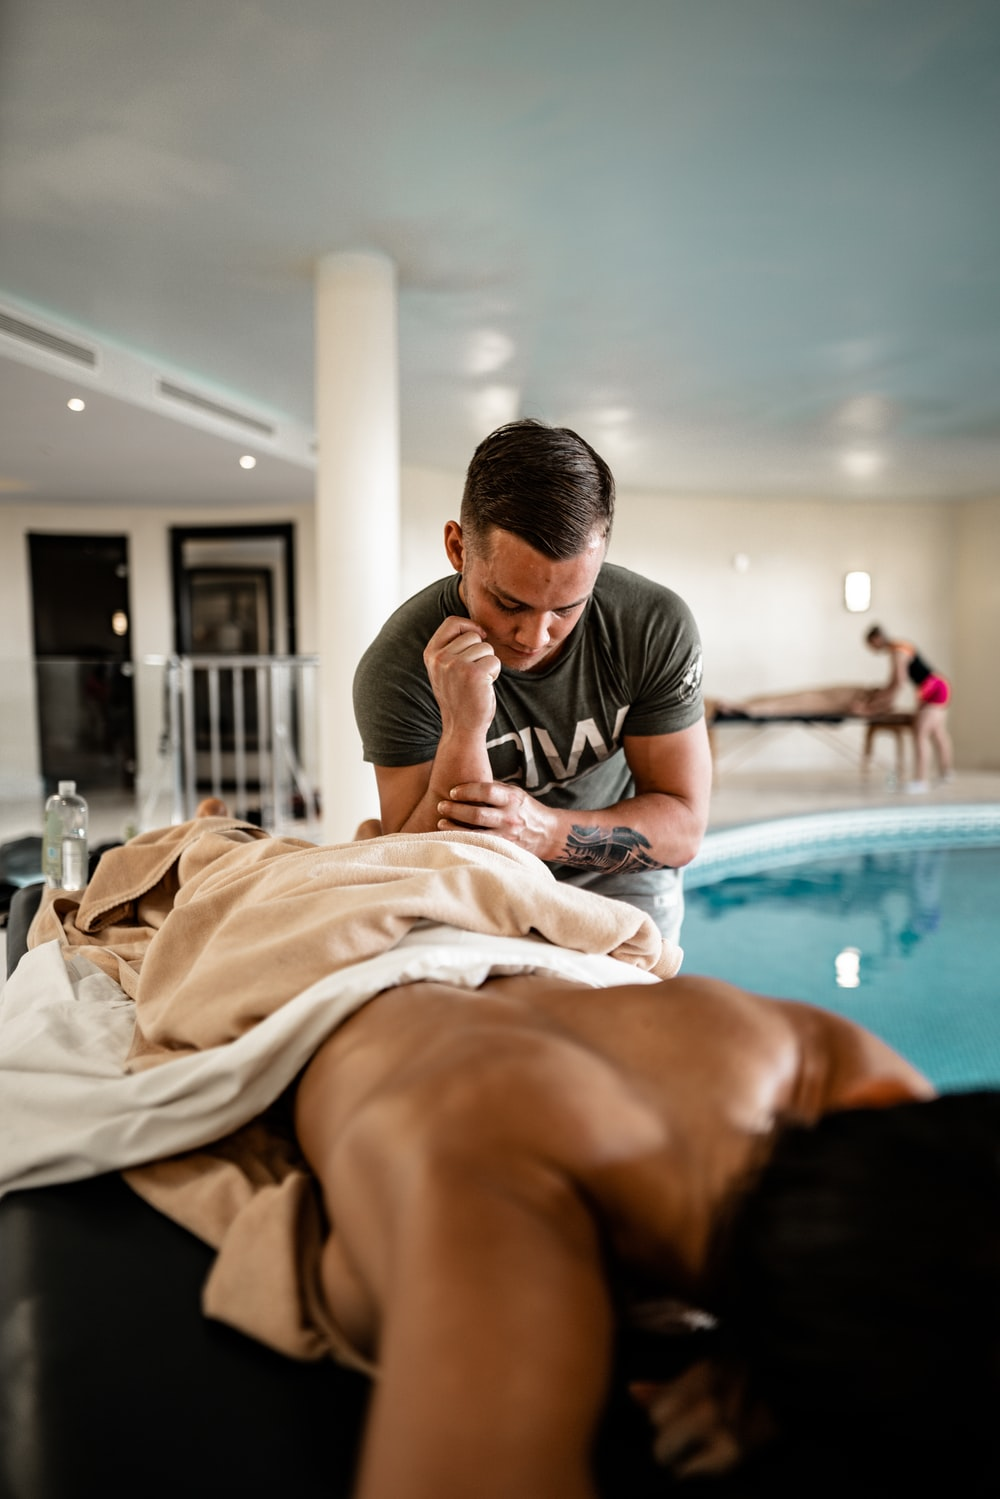 photography of man massaging a woman